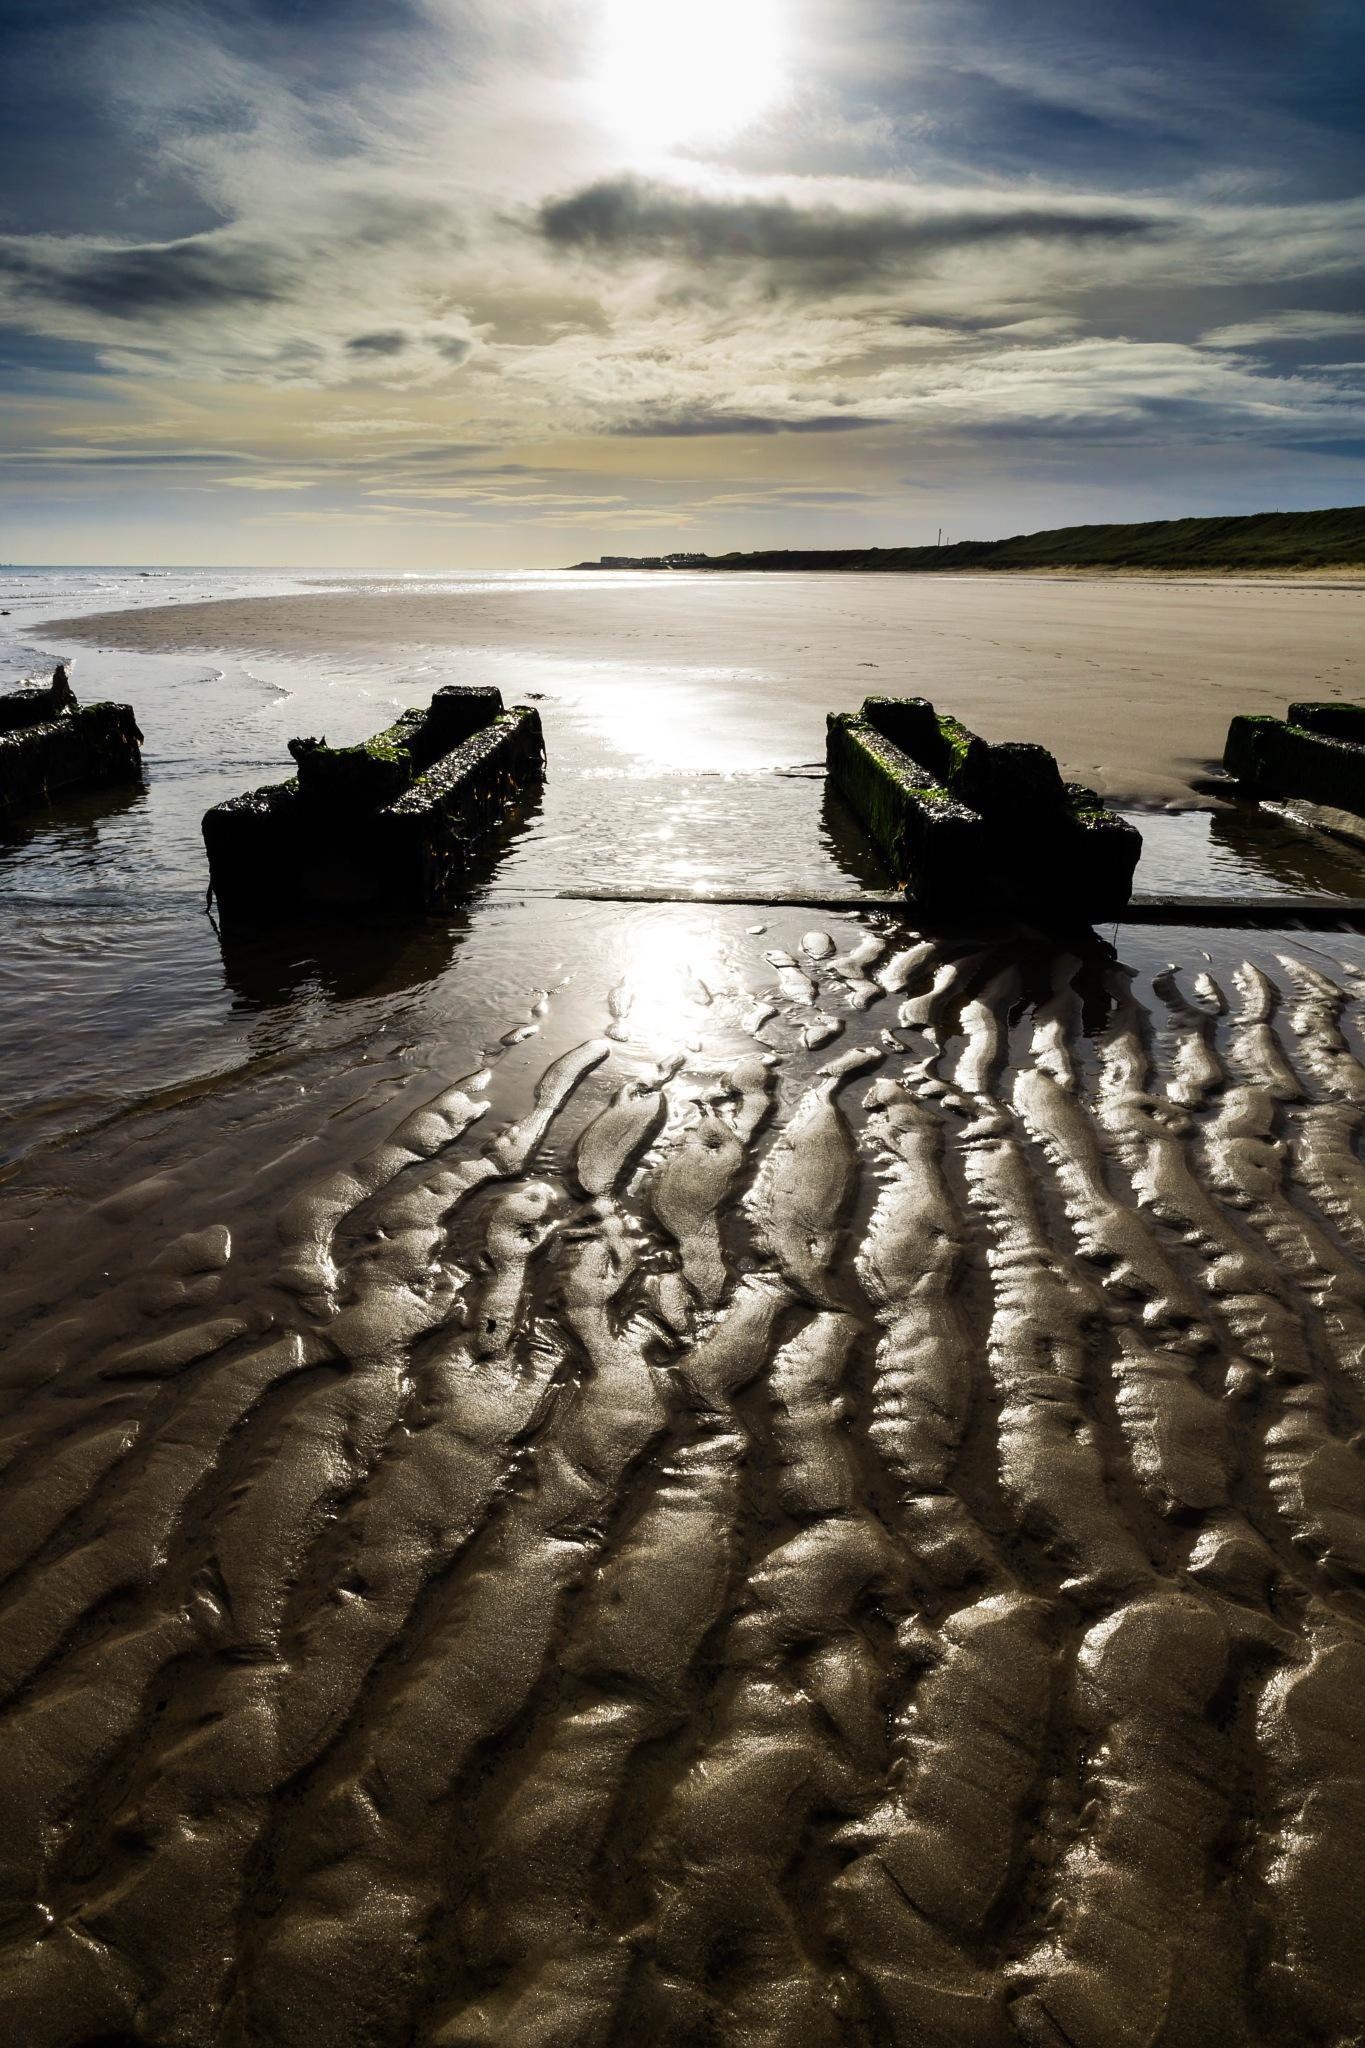 Low tide by Peter Edwardo Vicente.